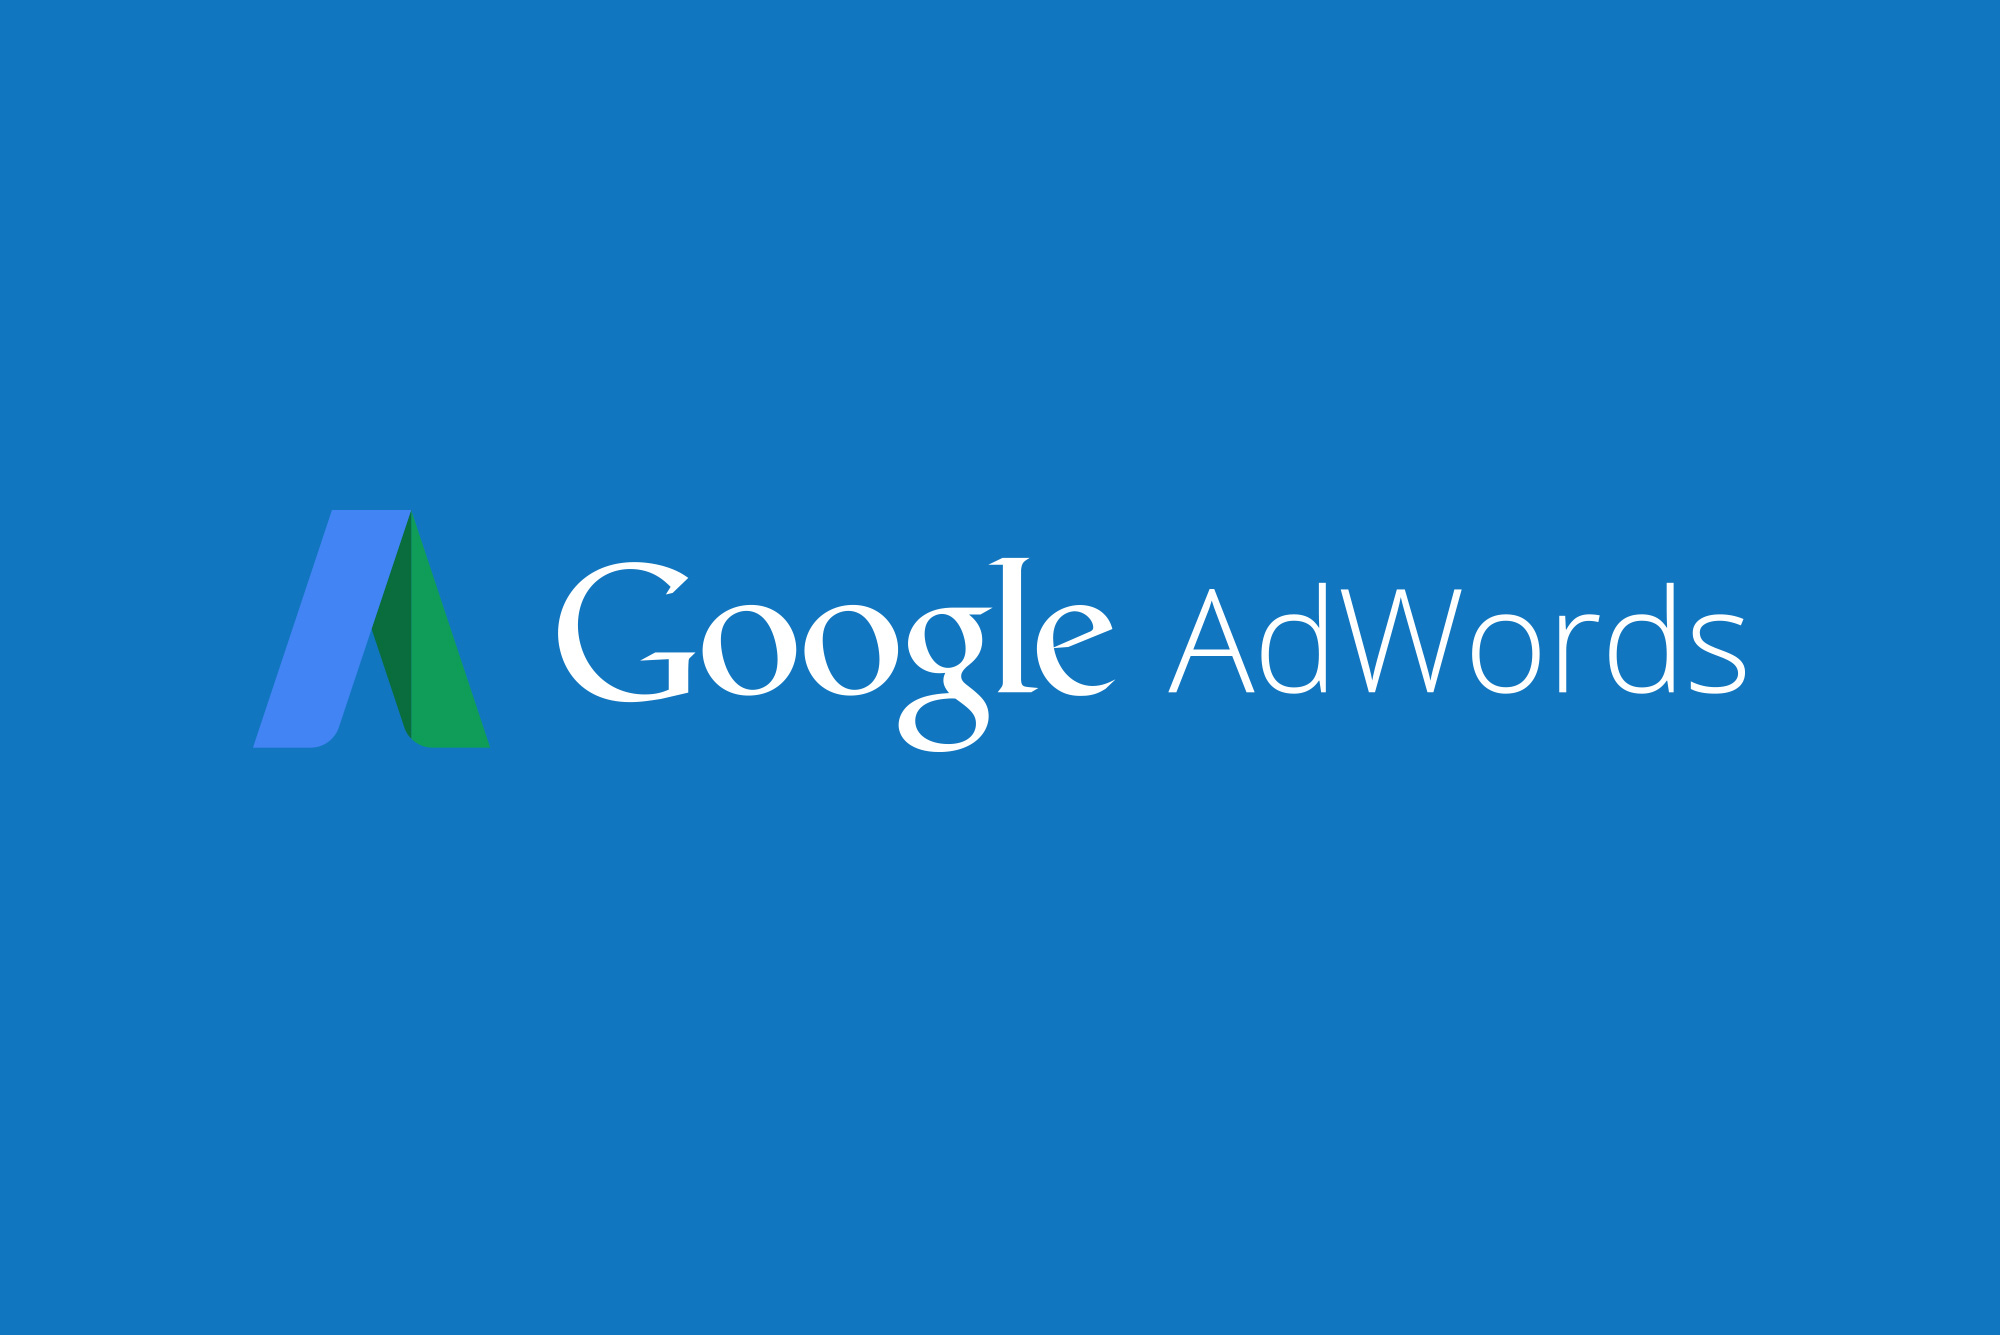 Google AdWords logo on blue background